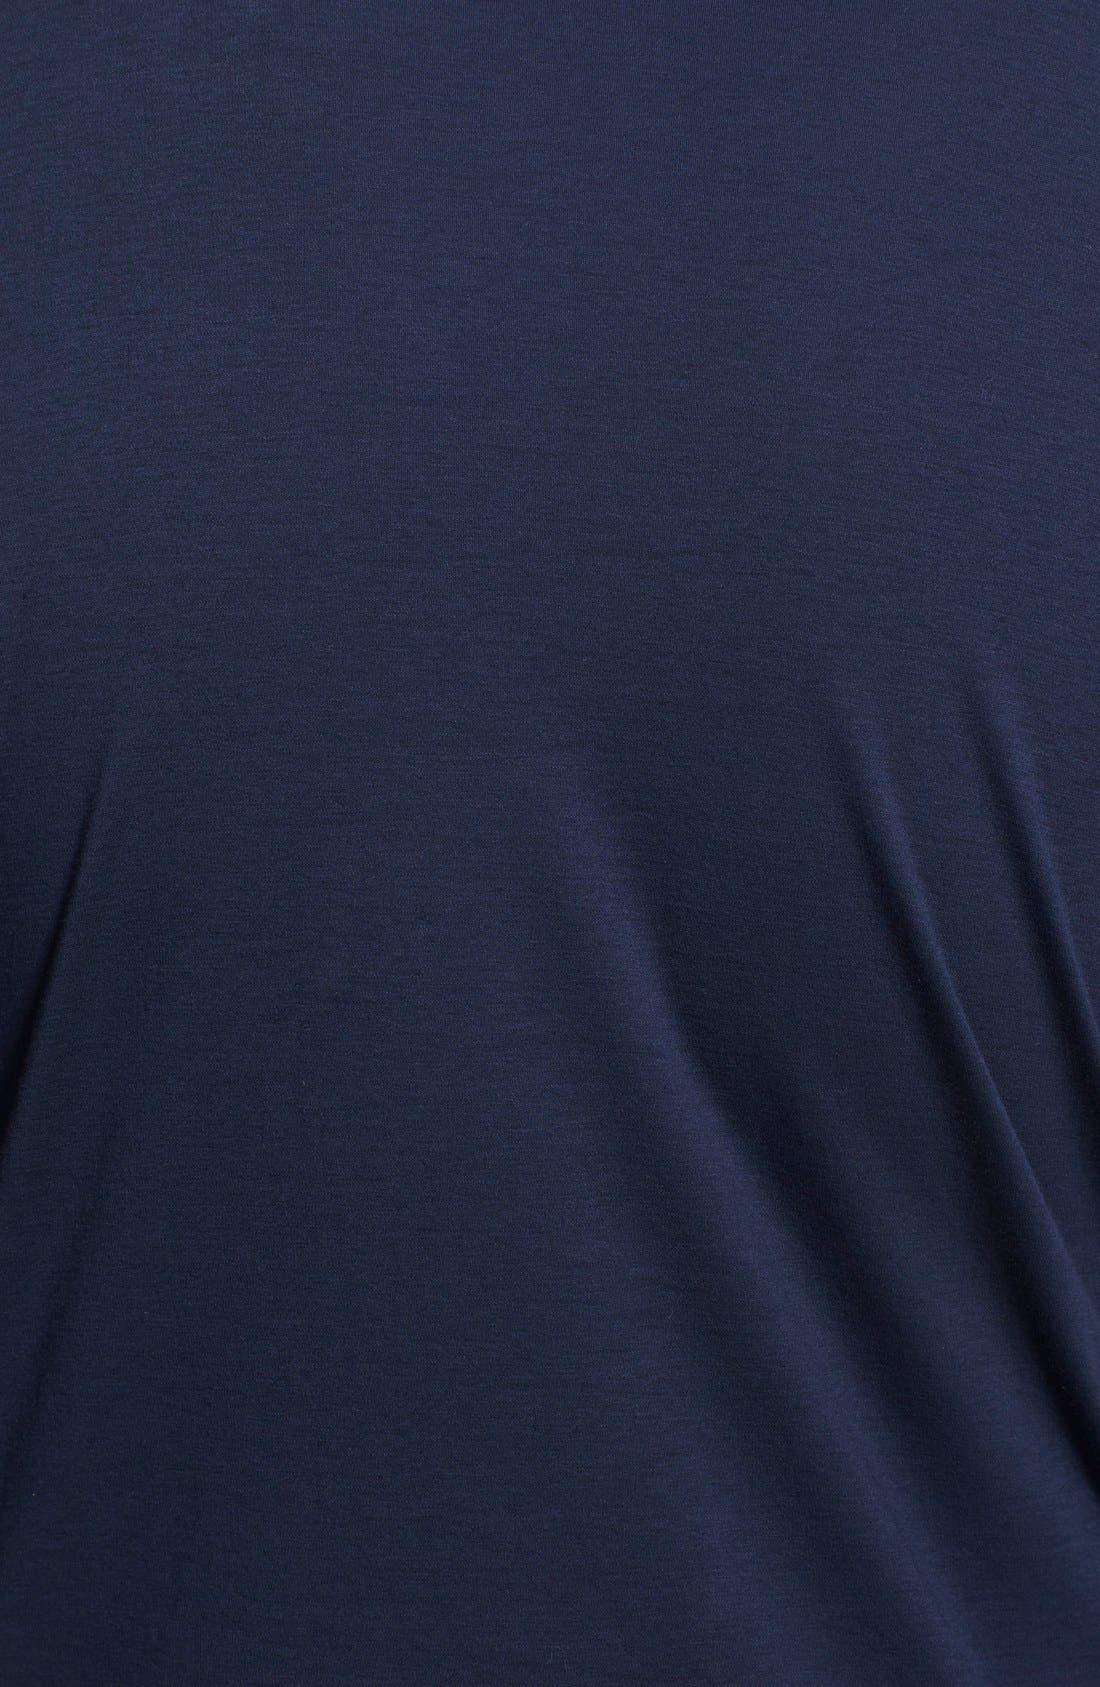 Alternate Image 3  - Armani Collezioni Cotton Jersey T-Shirt